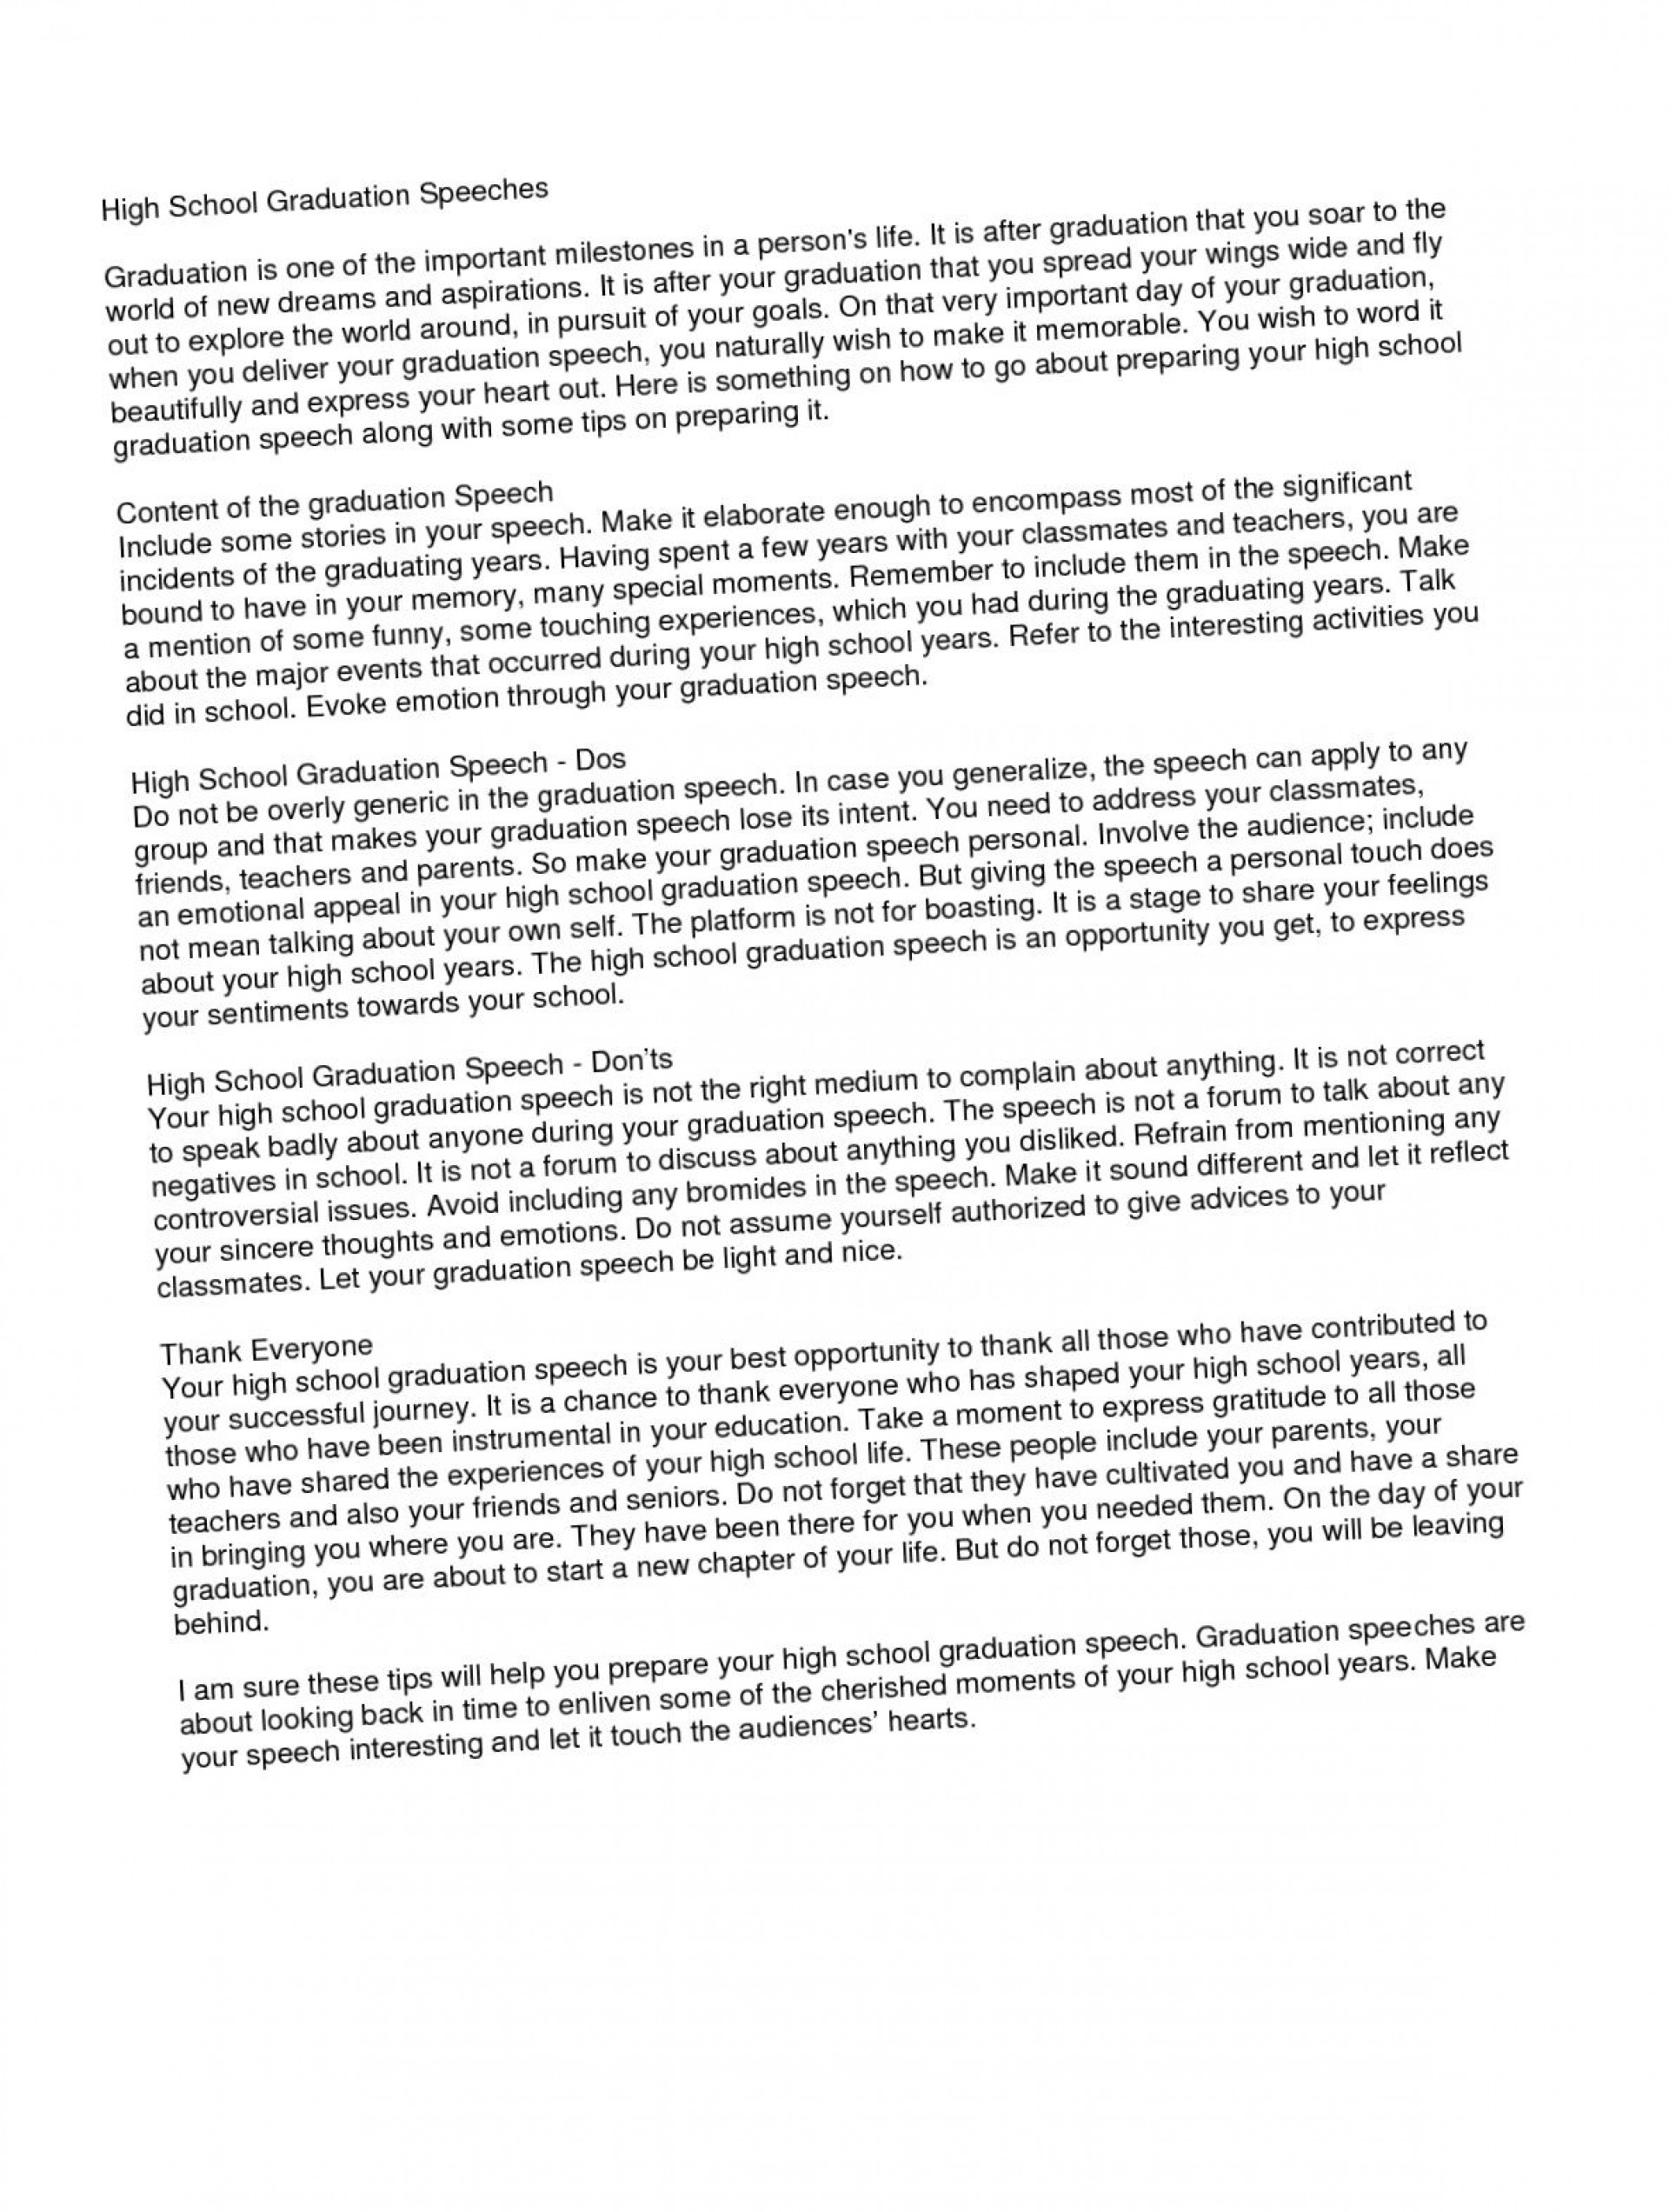 003 High School Graduation Essay Day Example L Rare Ceremony 1920